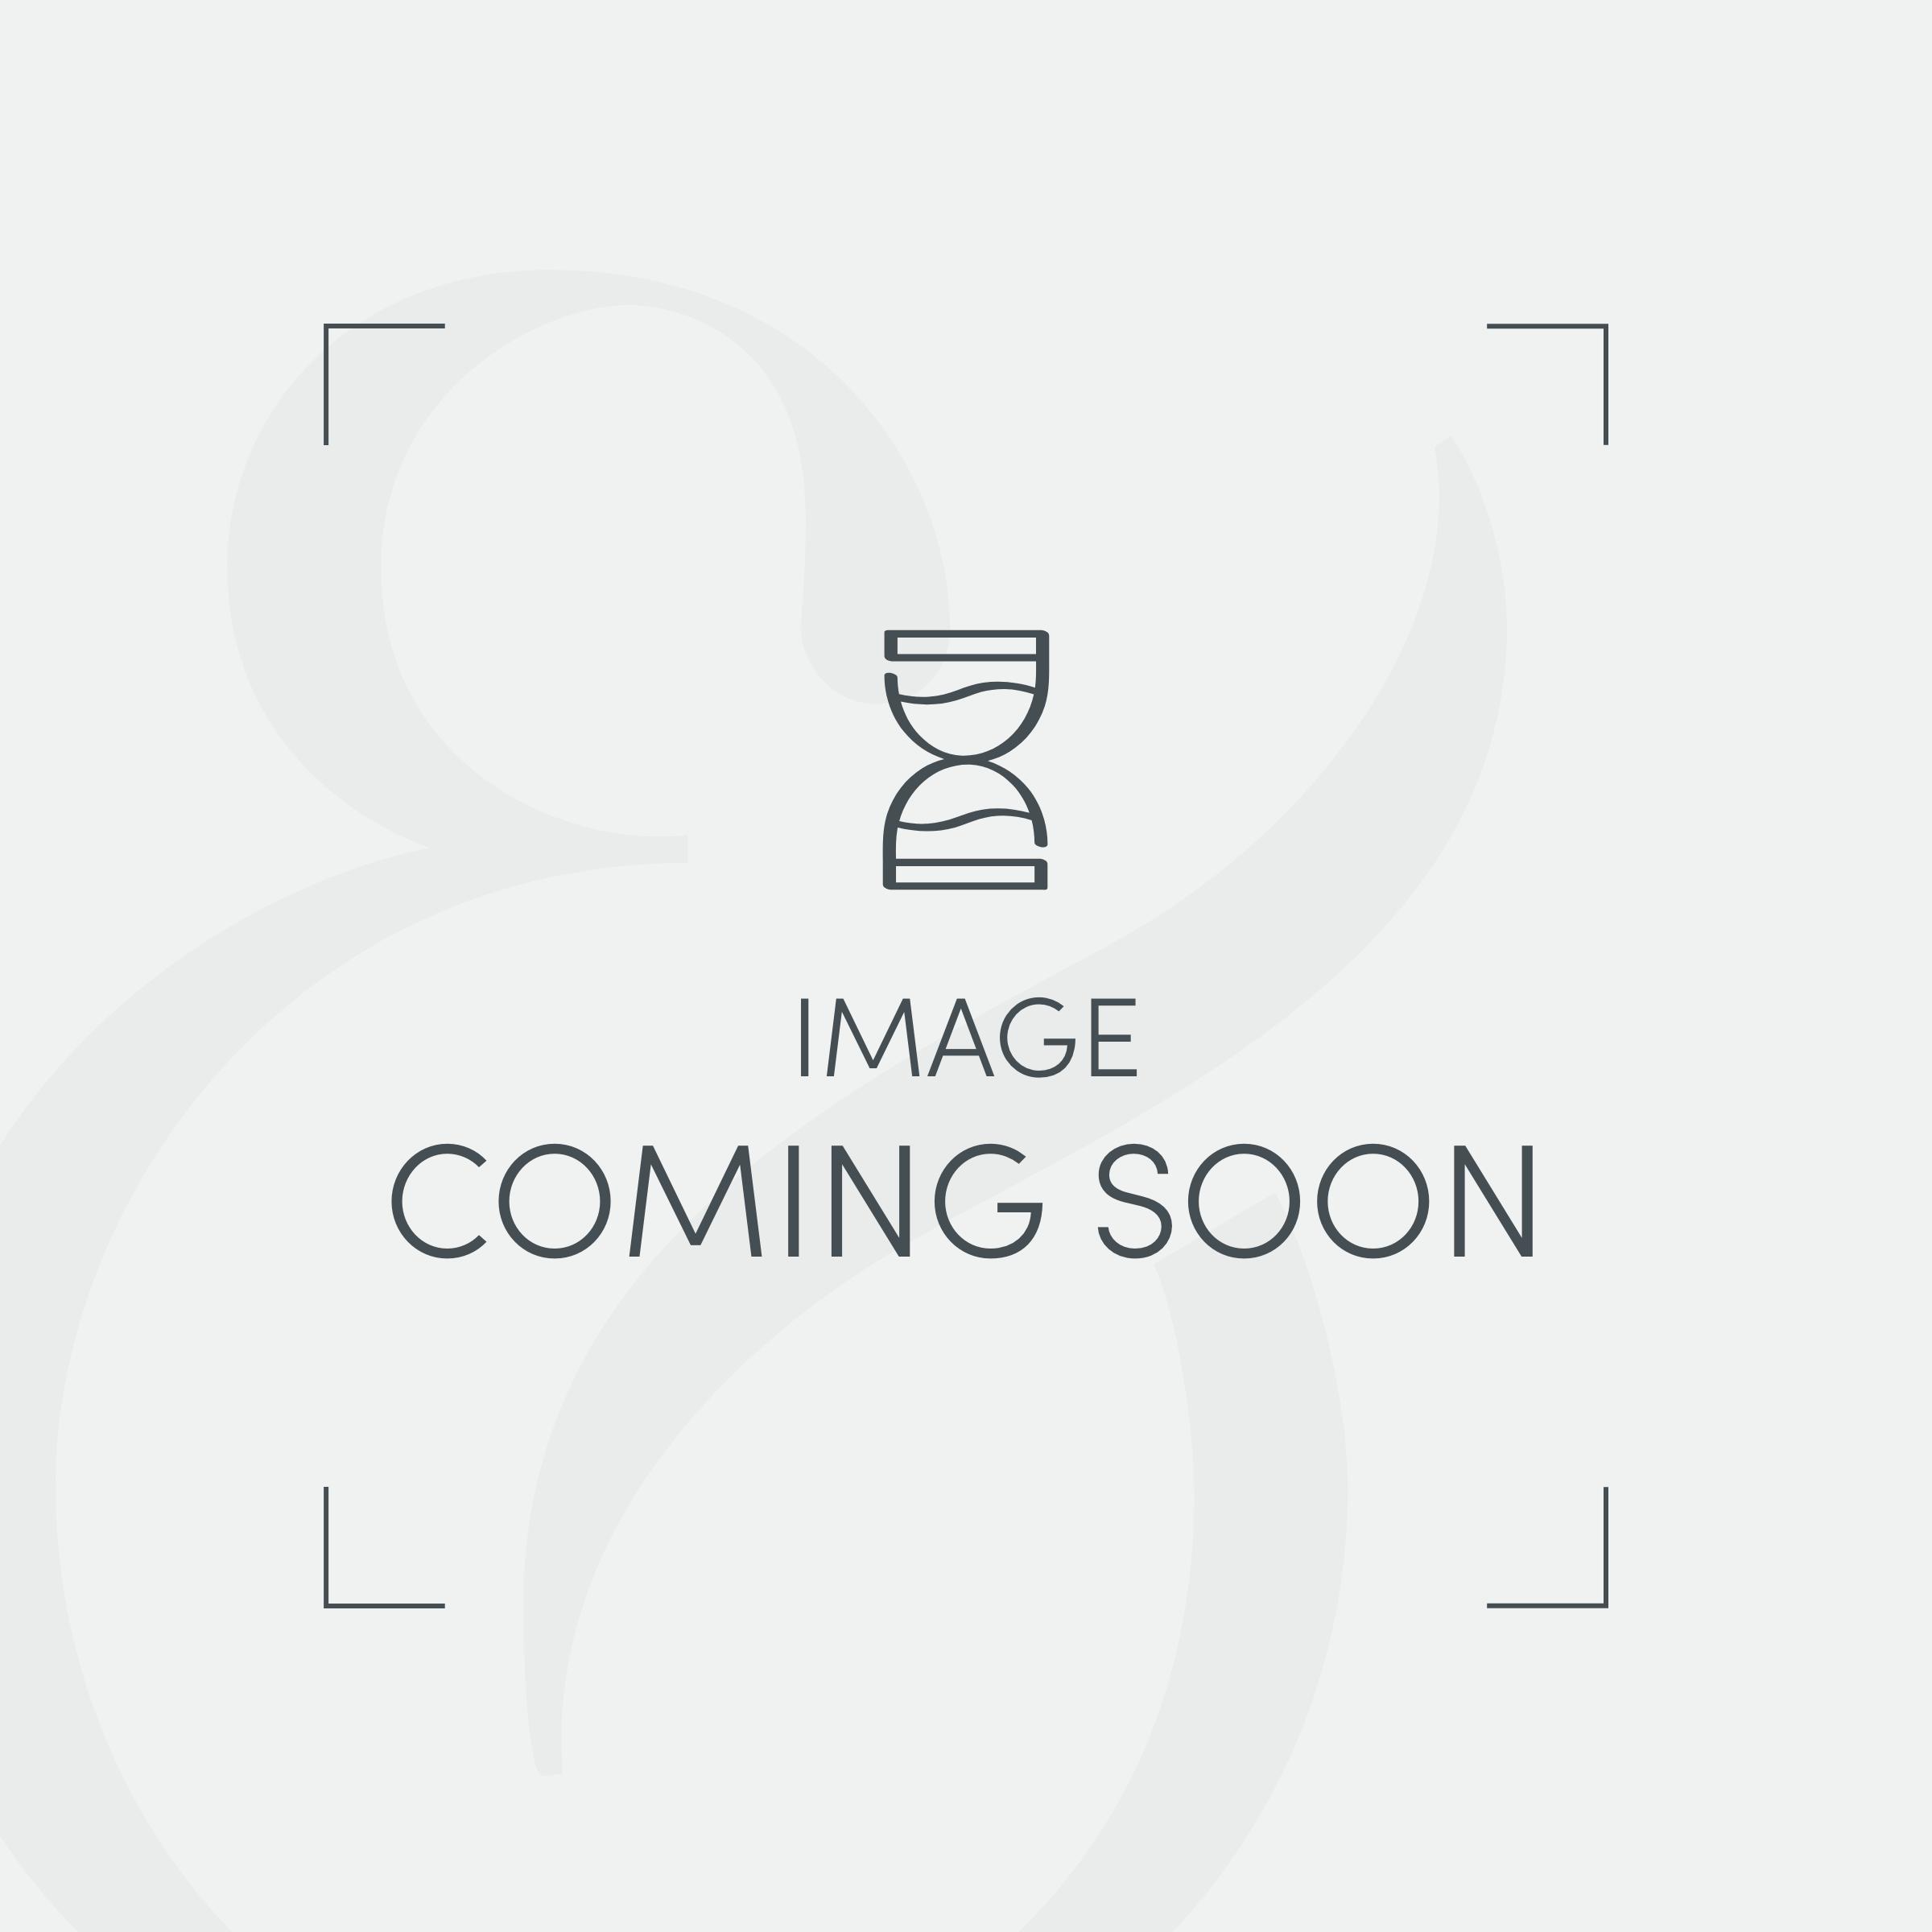 Easycare 180TC Bed Linen - 2 x Standard Oxford Pillowcases - White